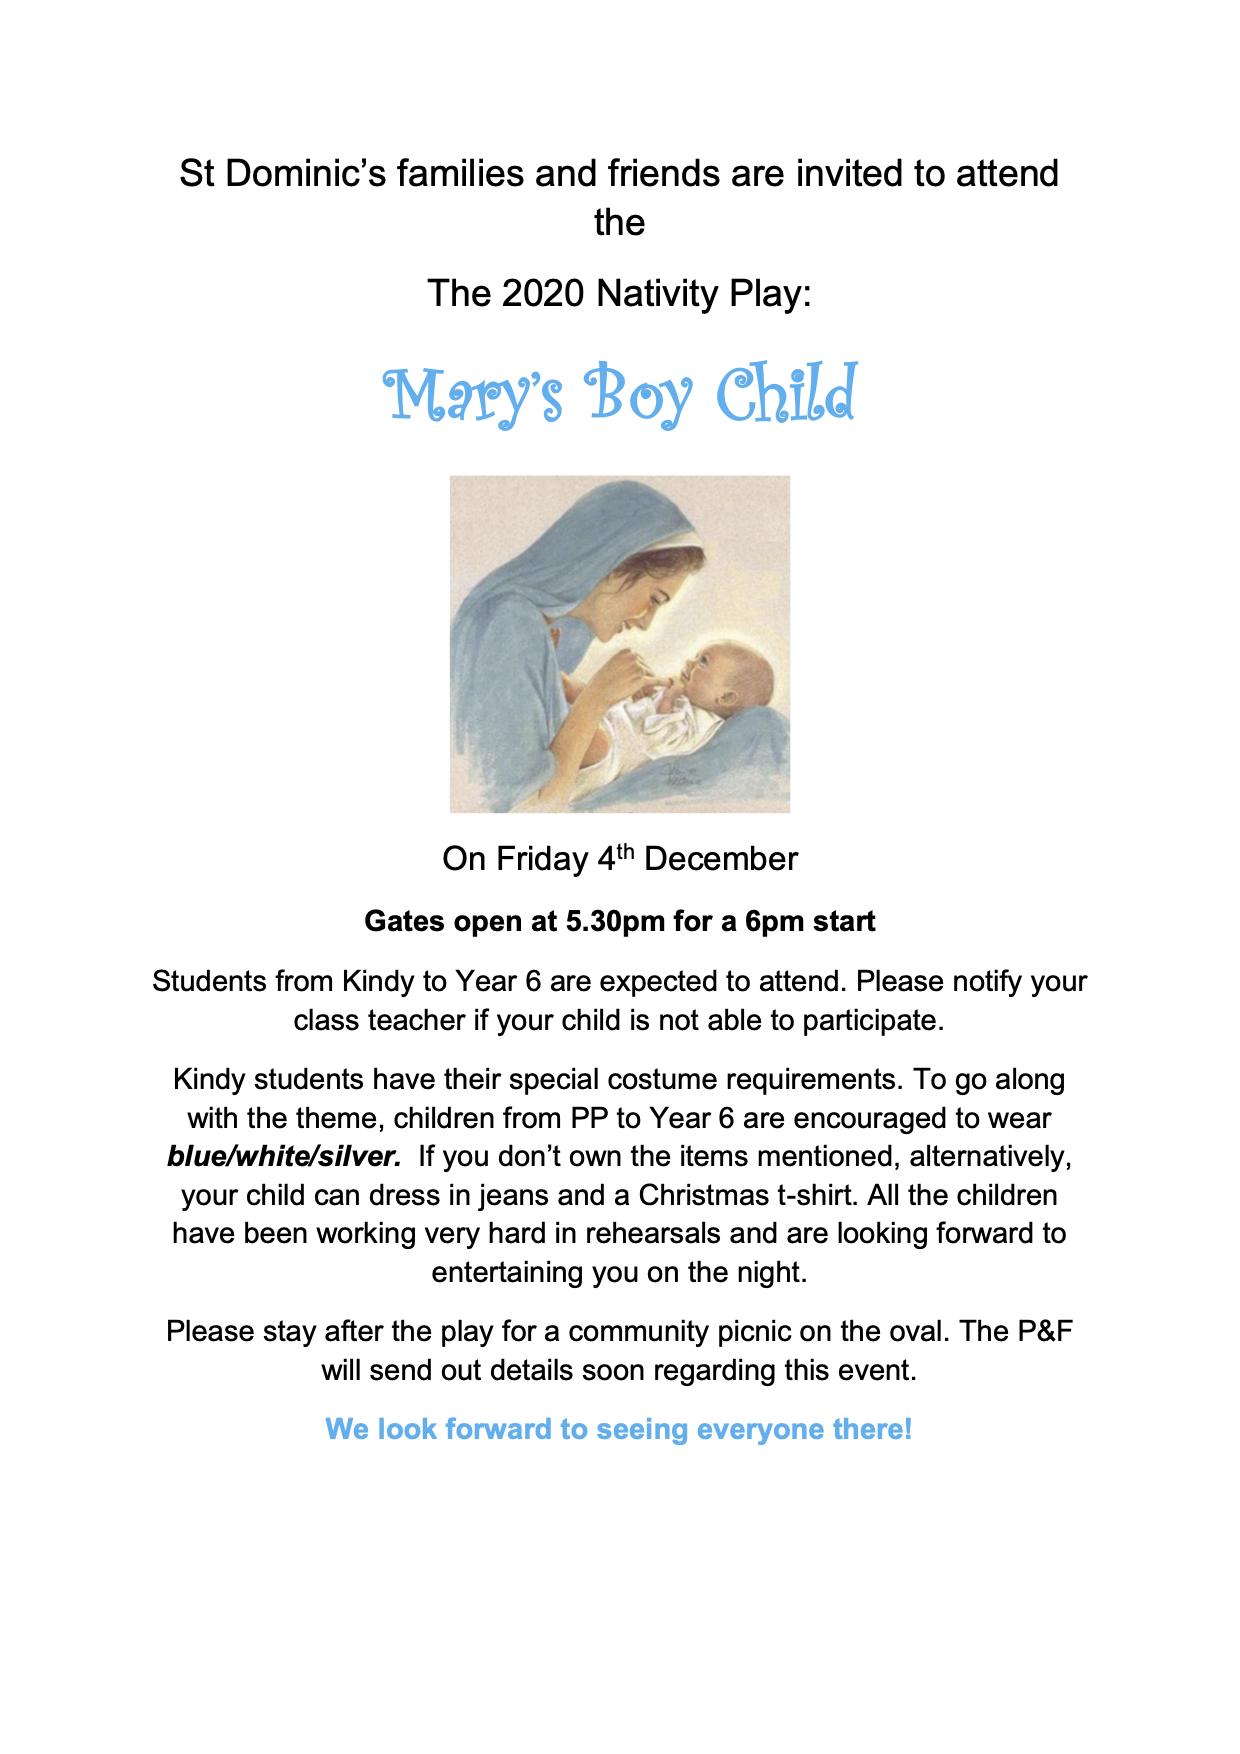 Important Nativity Play Information